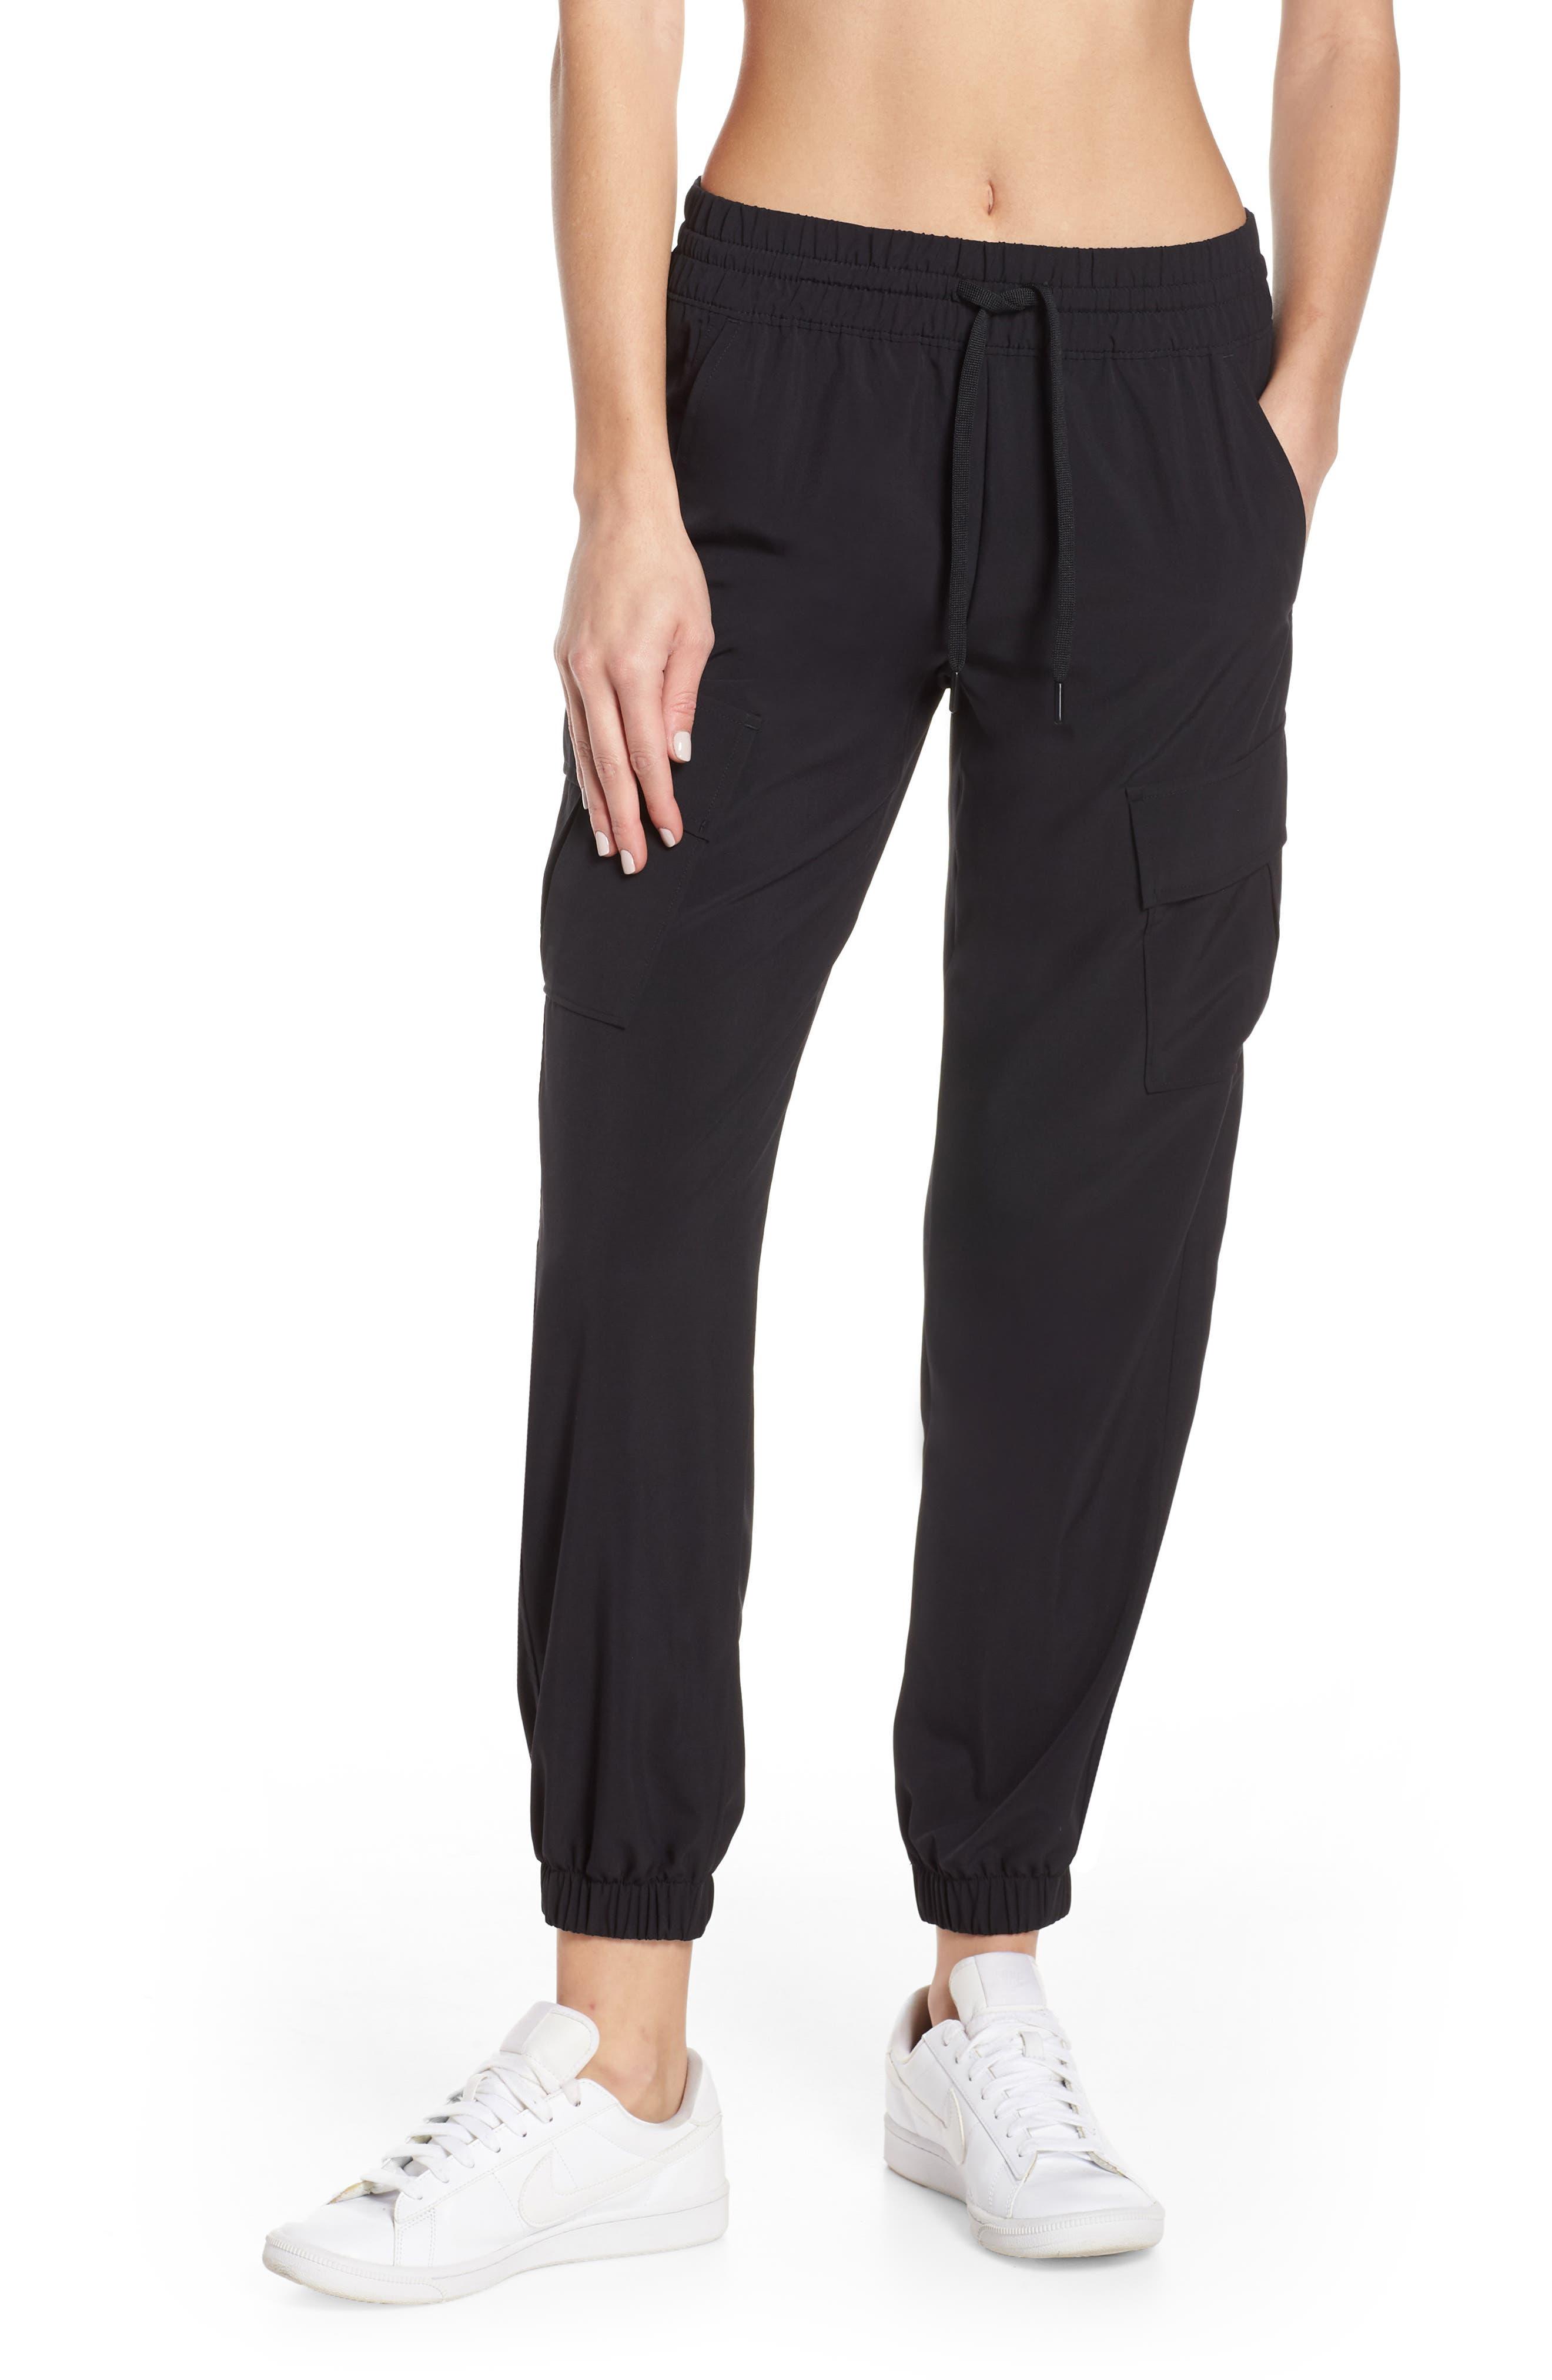 ZELLA Urban Cargo Jogger Pants, Main, color, BLACK